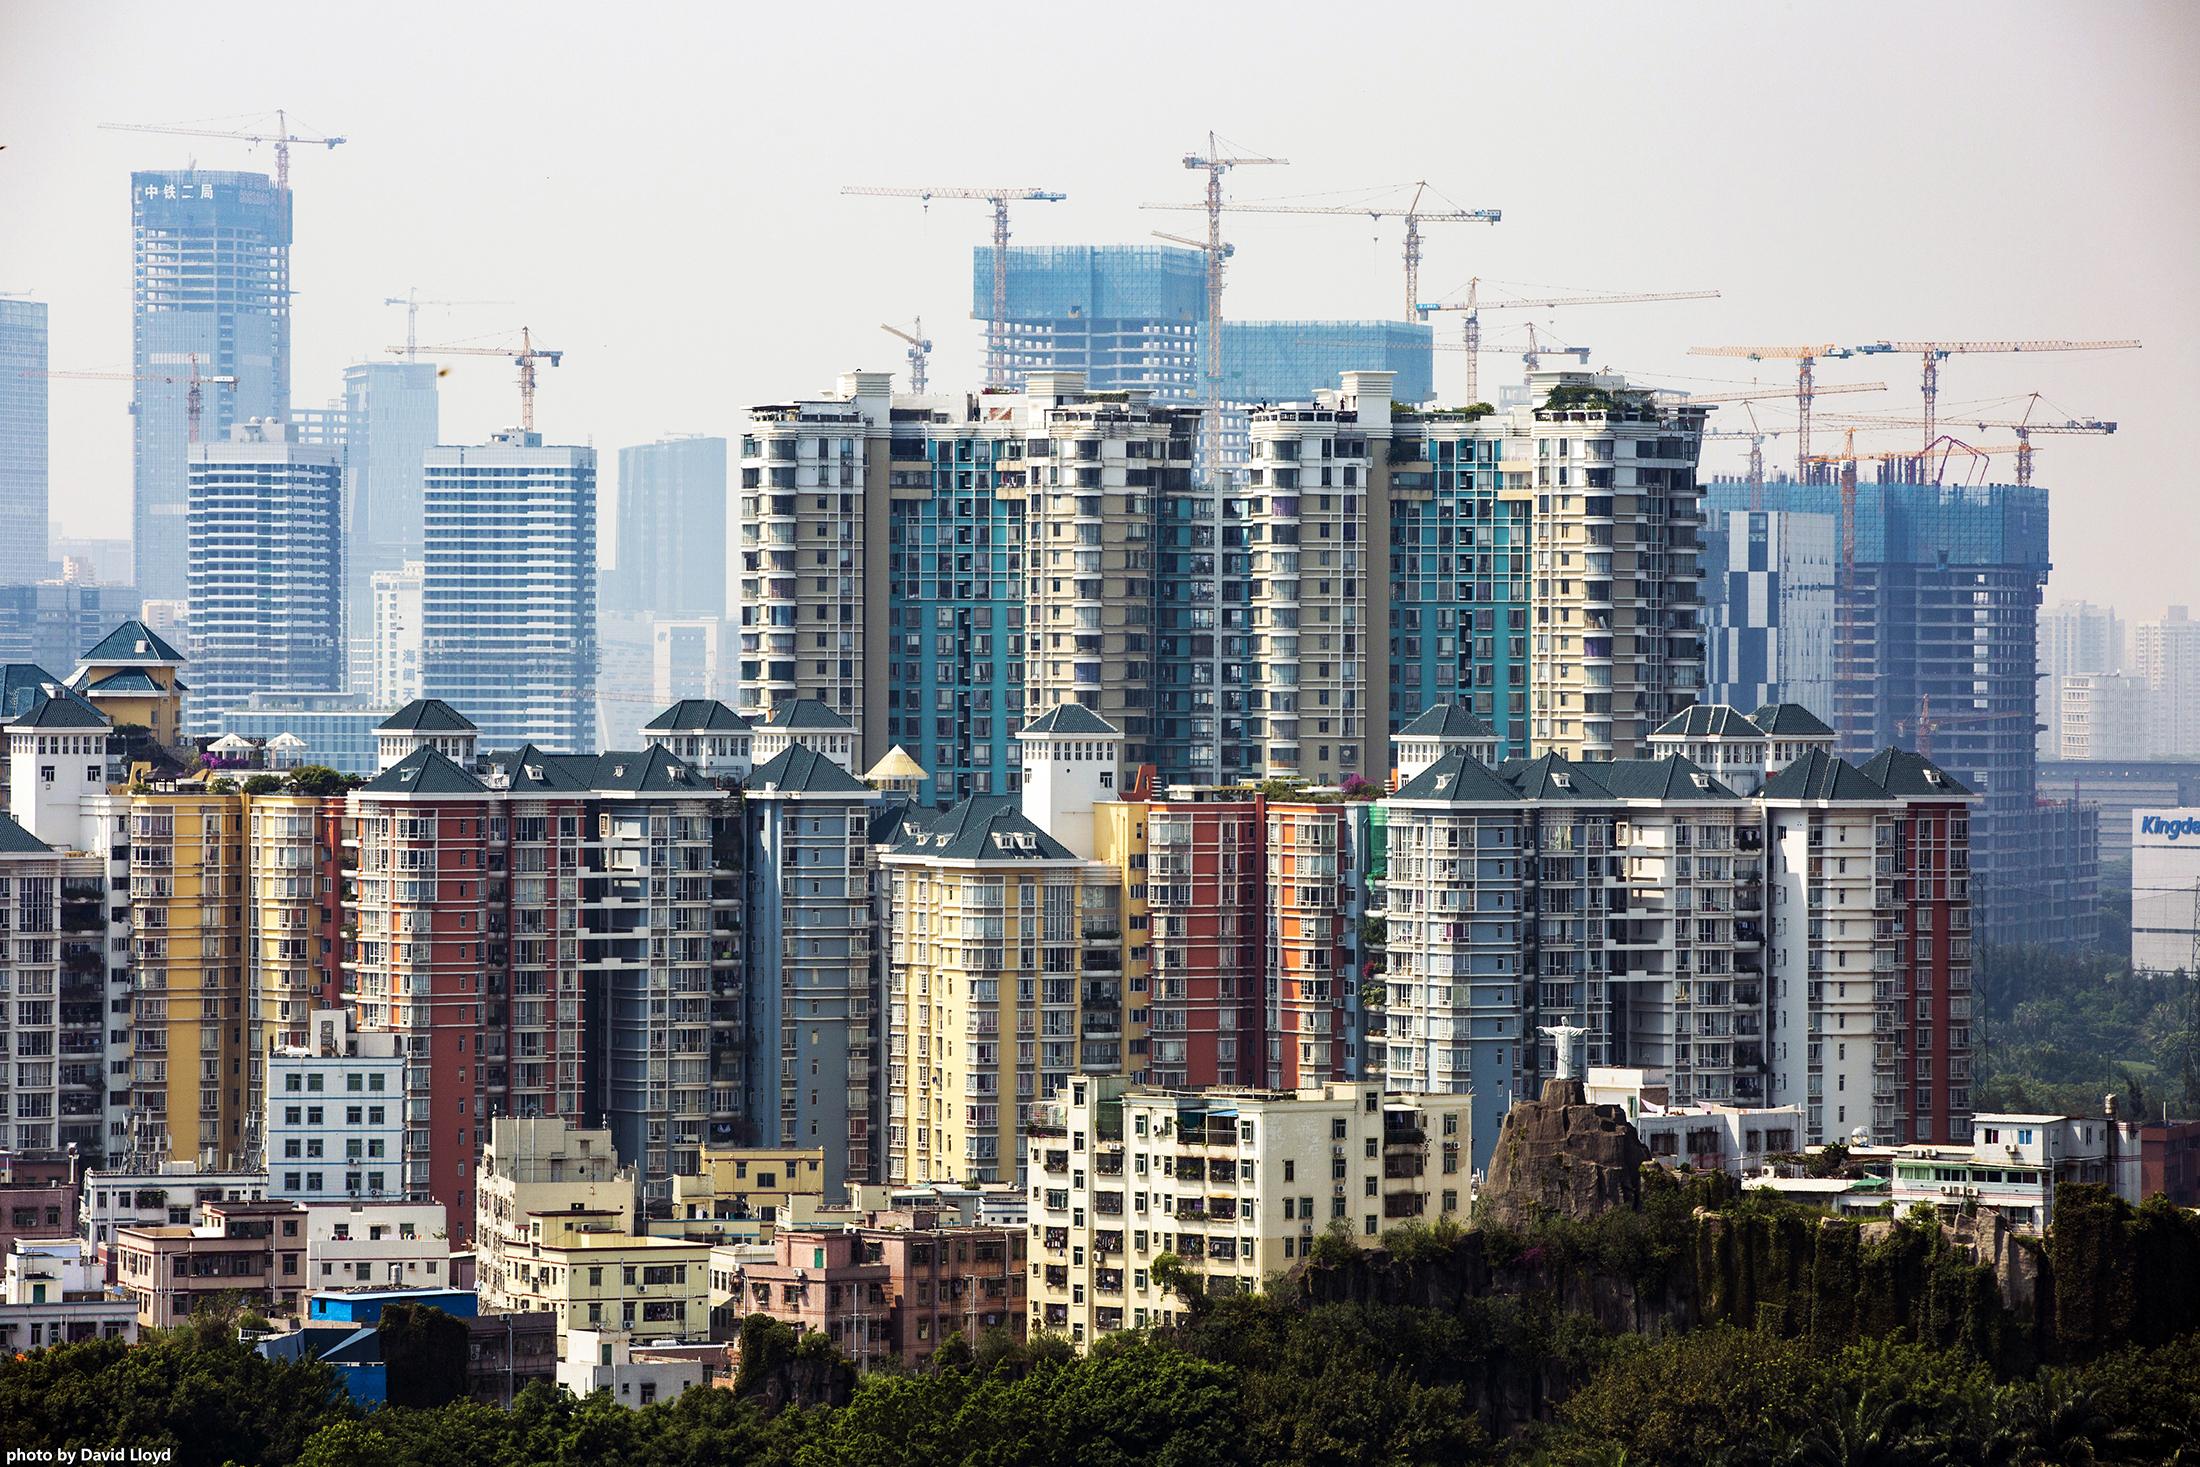 New Urbanization Speculation